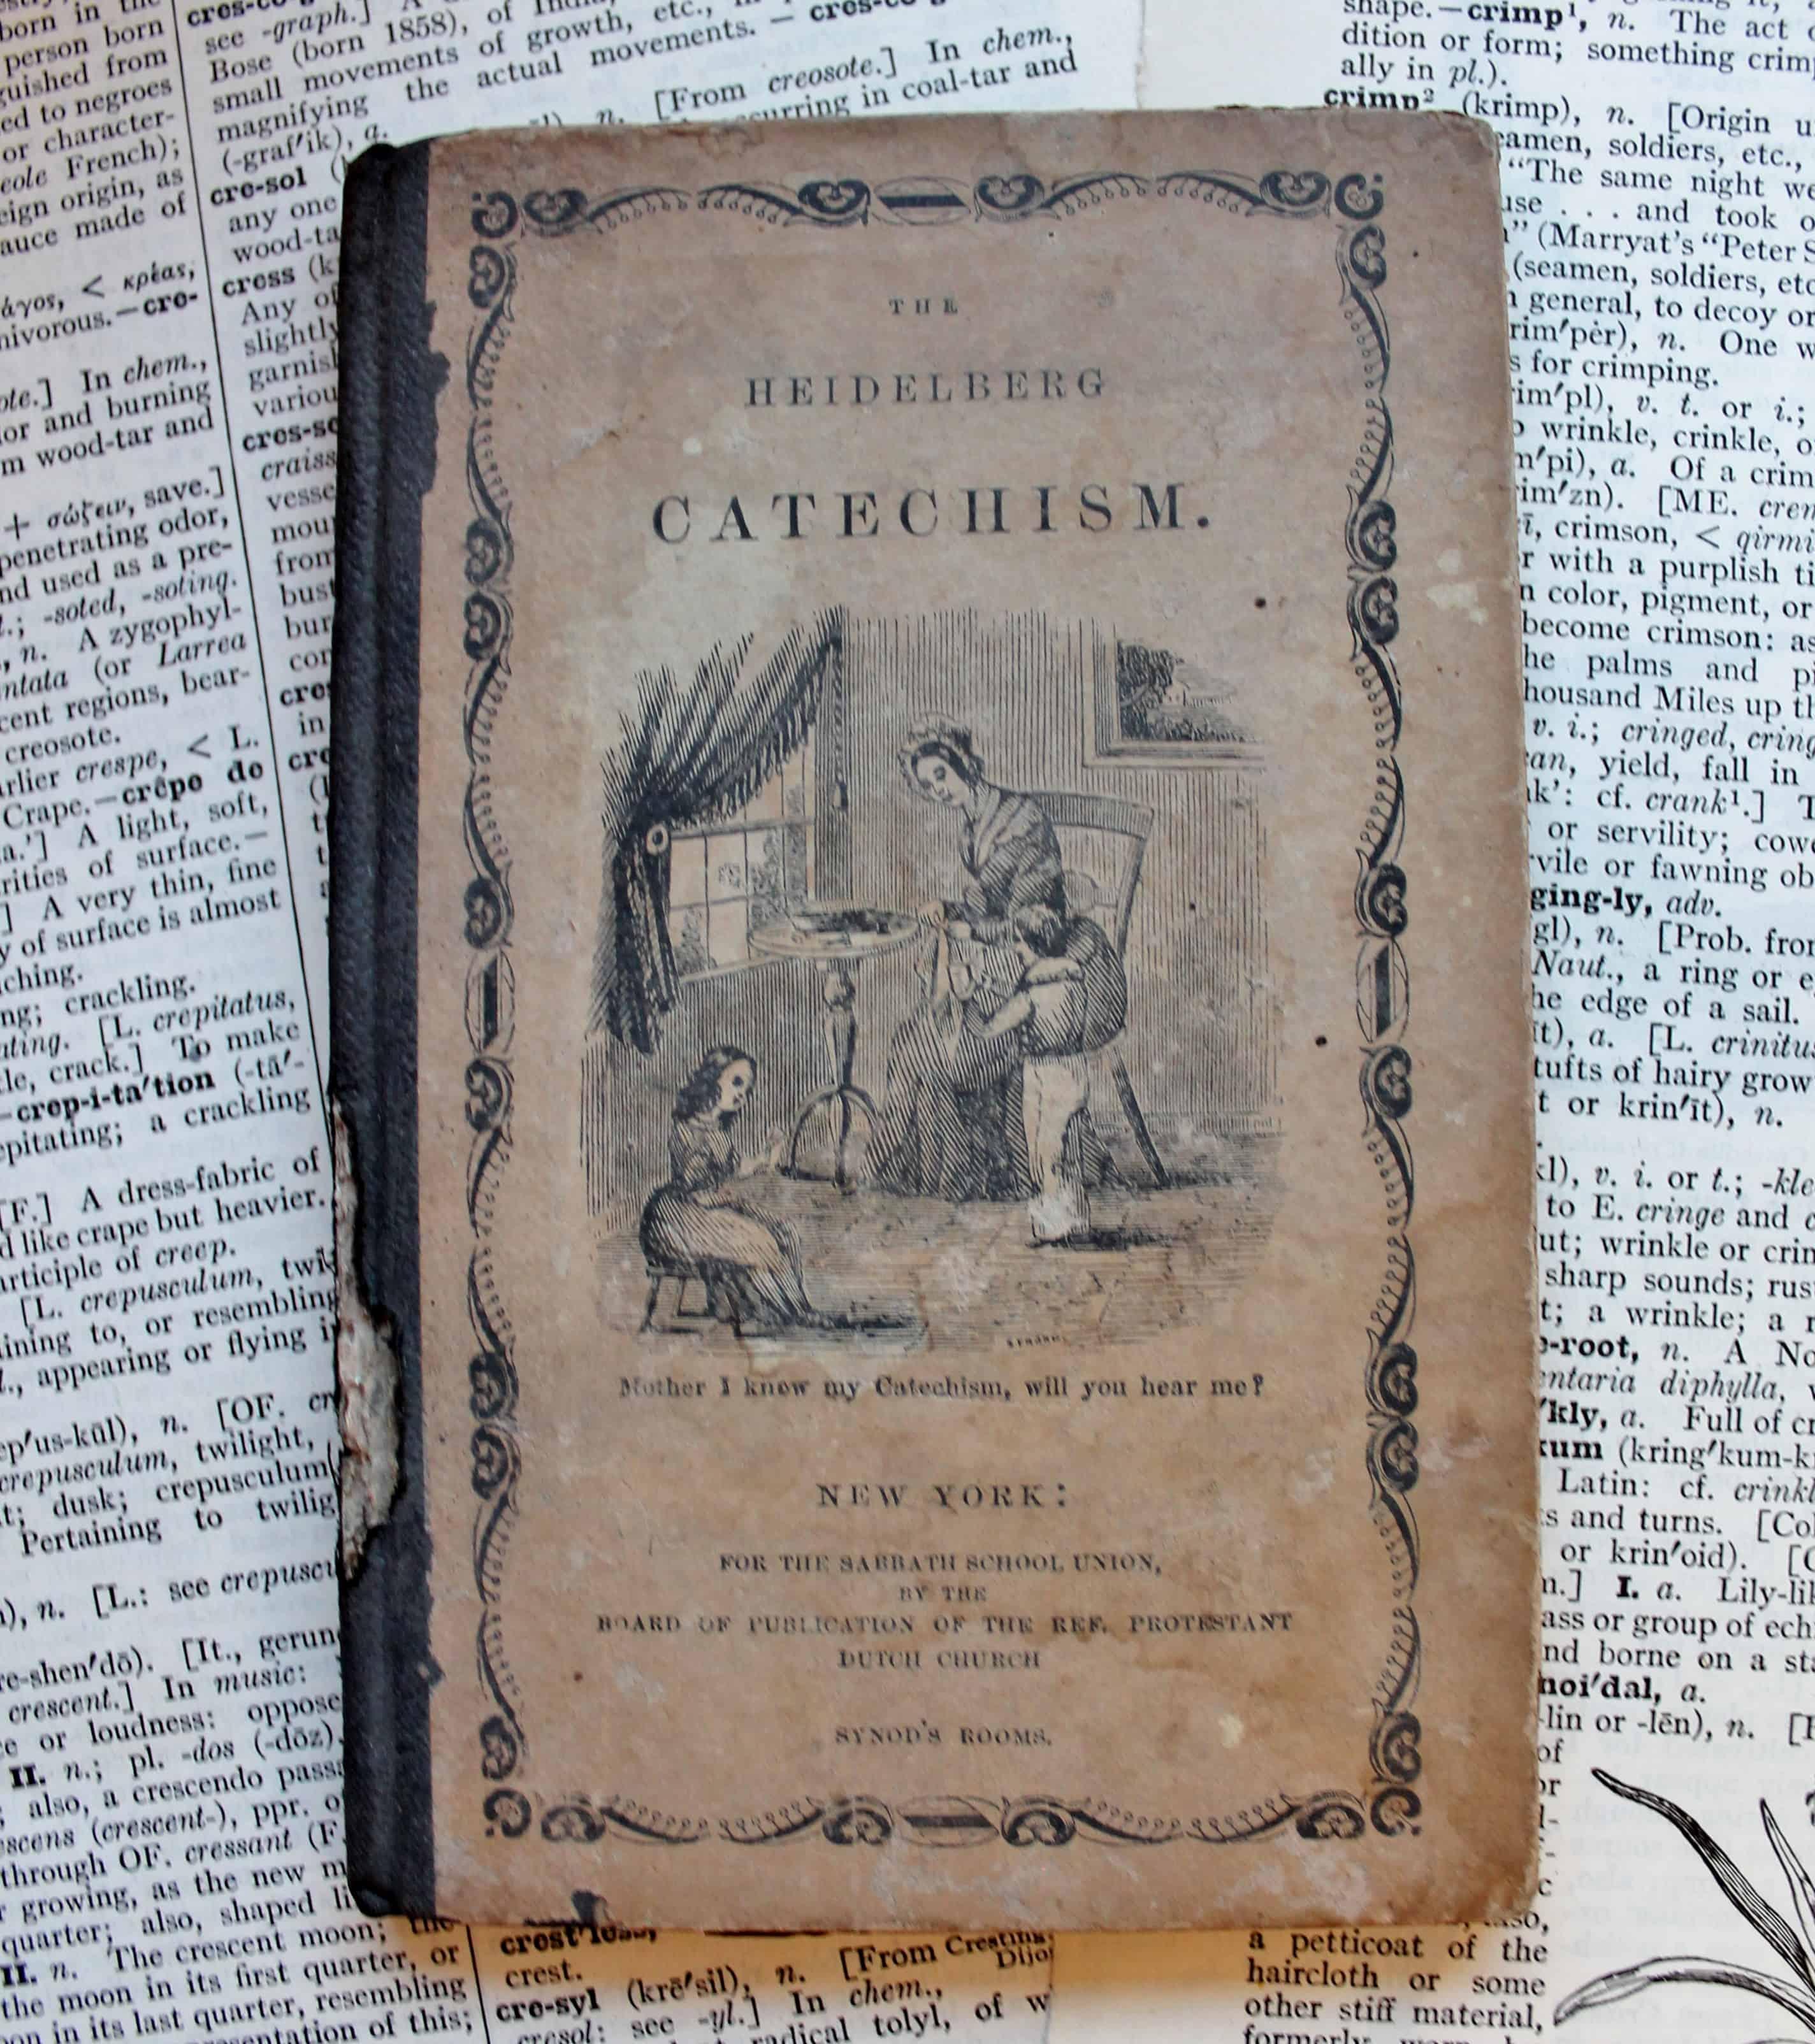 Antique catechism book (2)